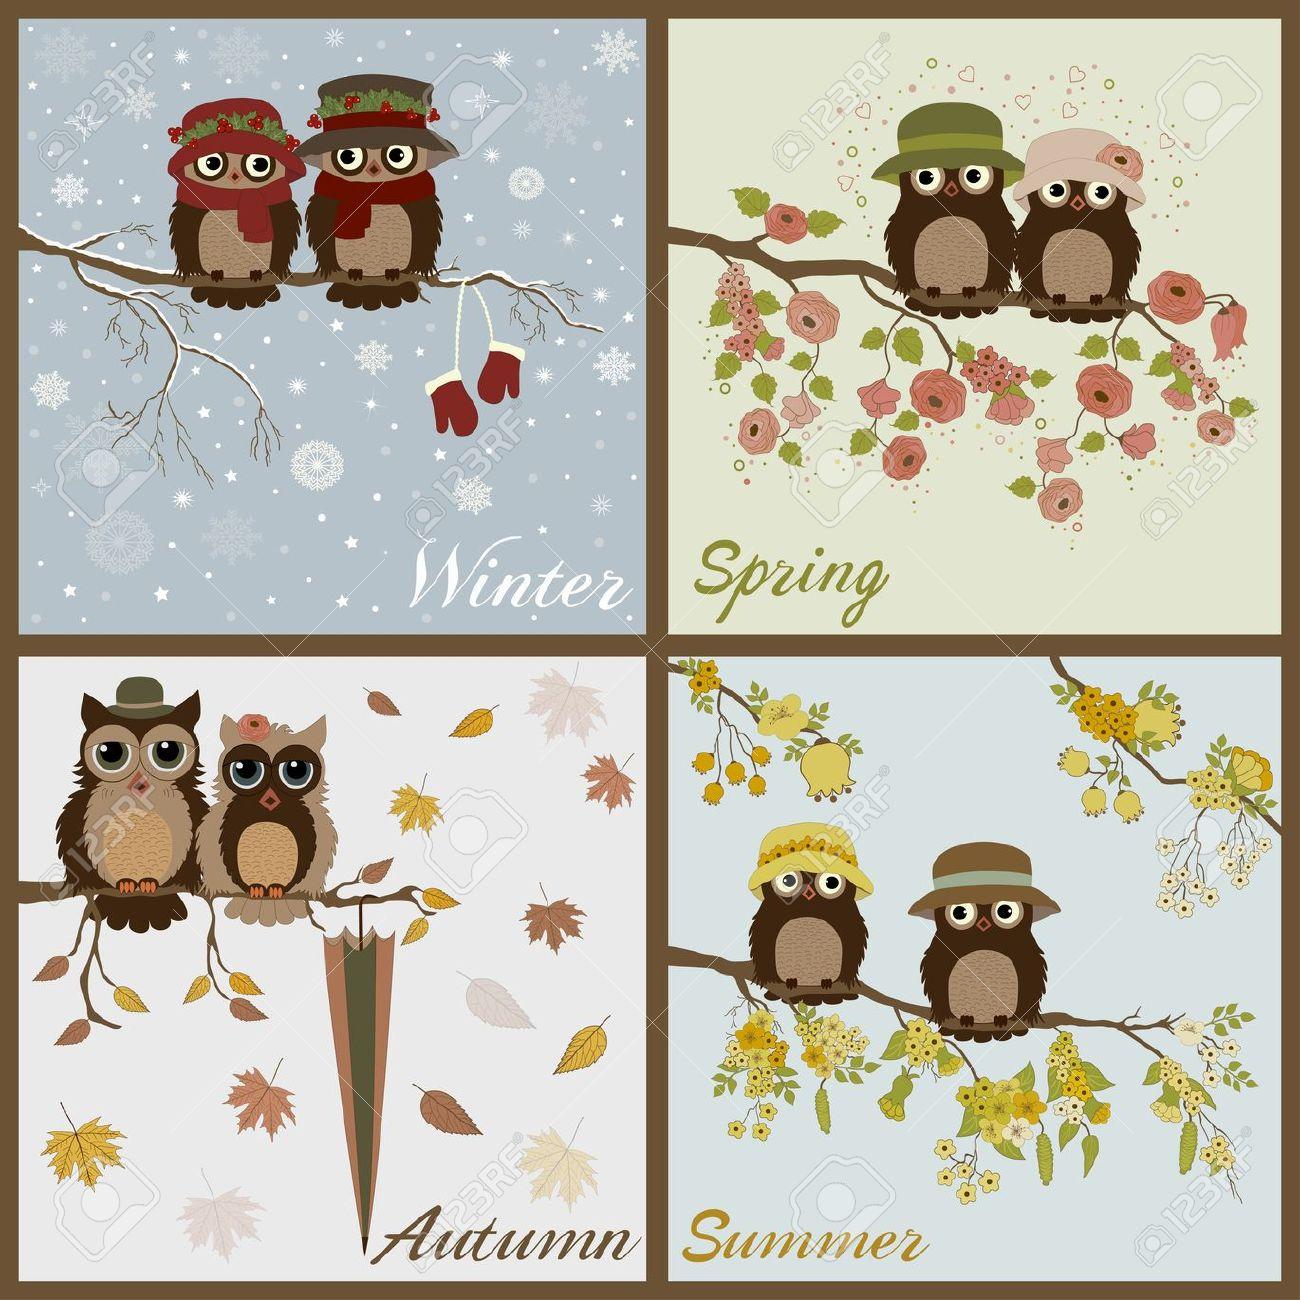 Hiboux 4 saisons